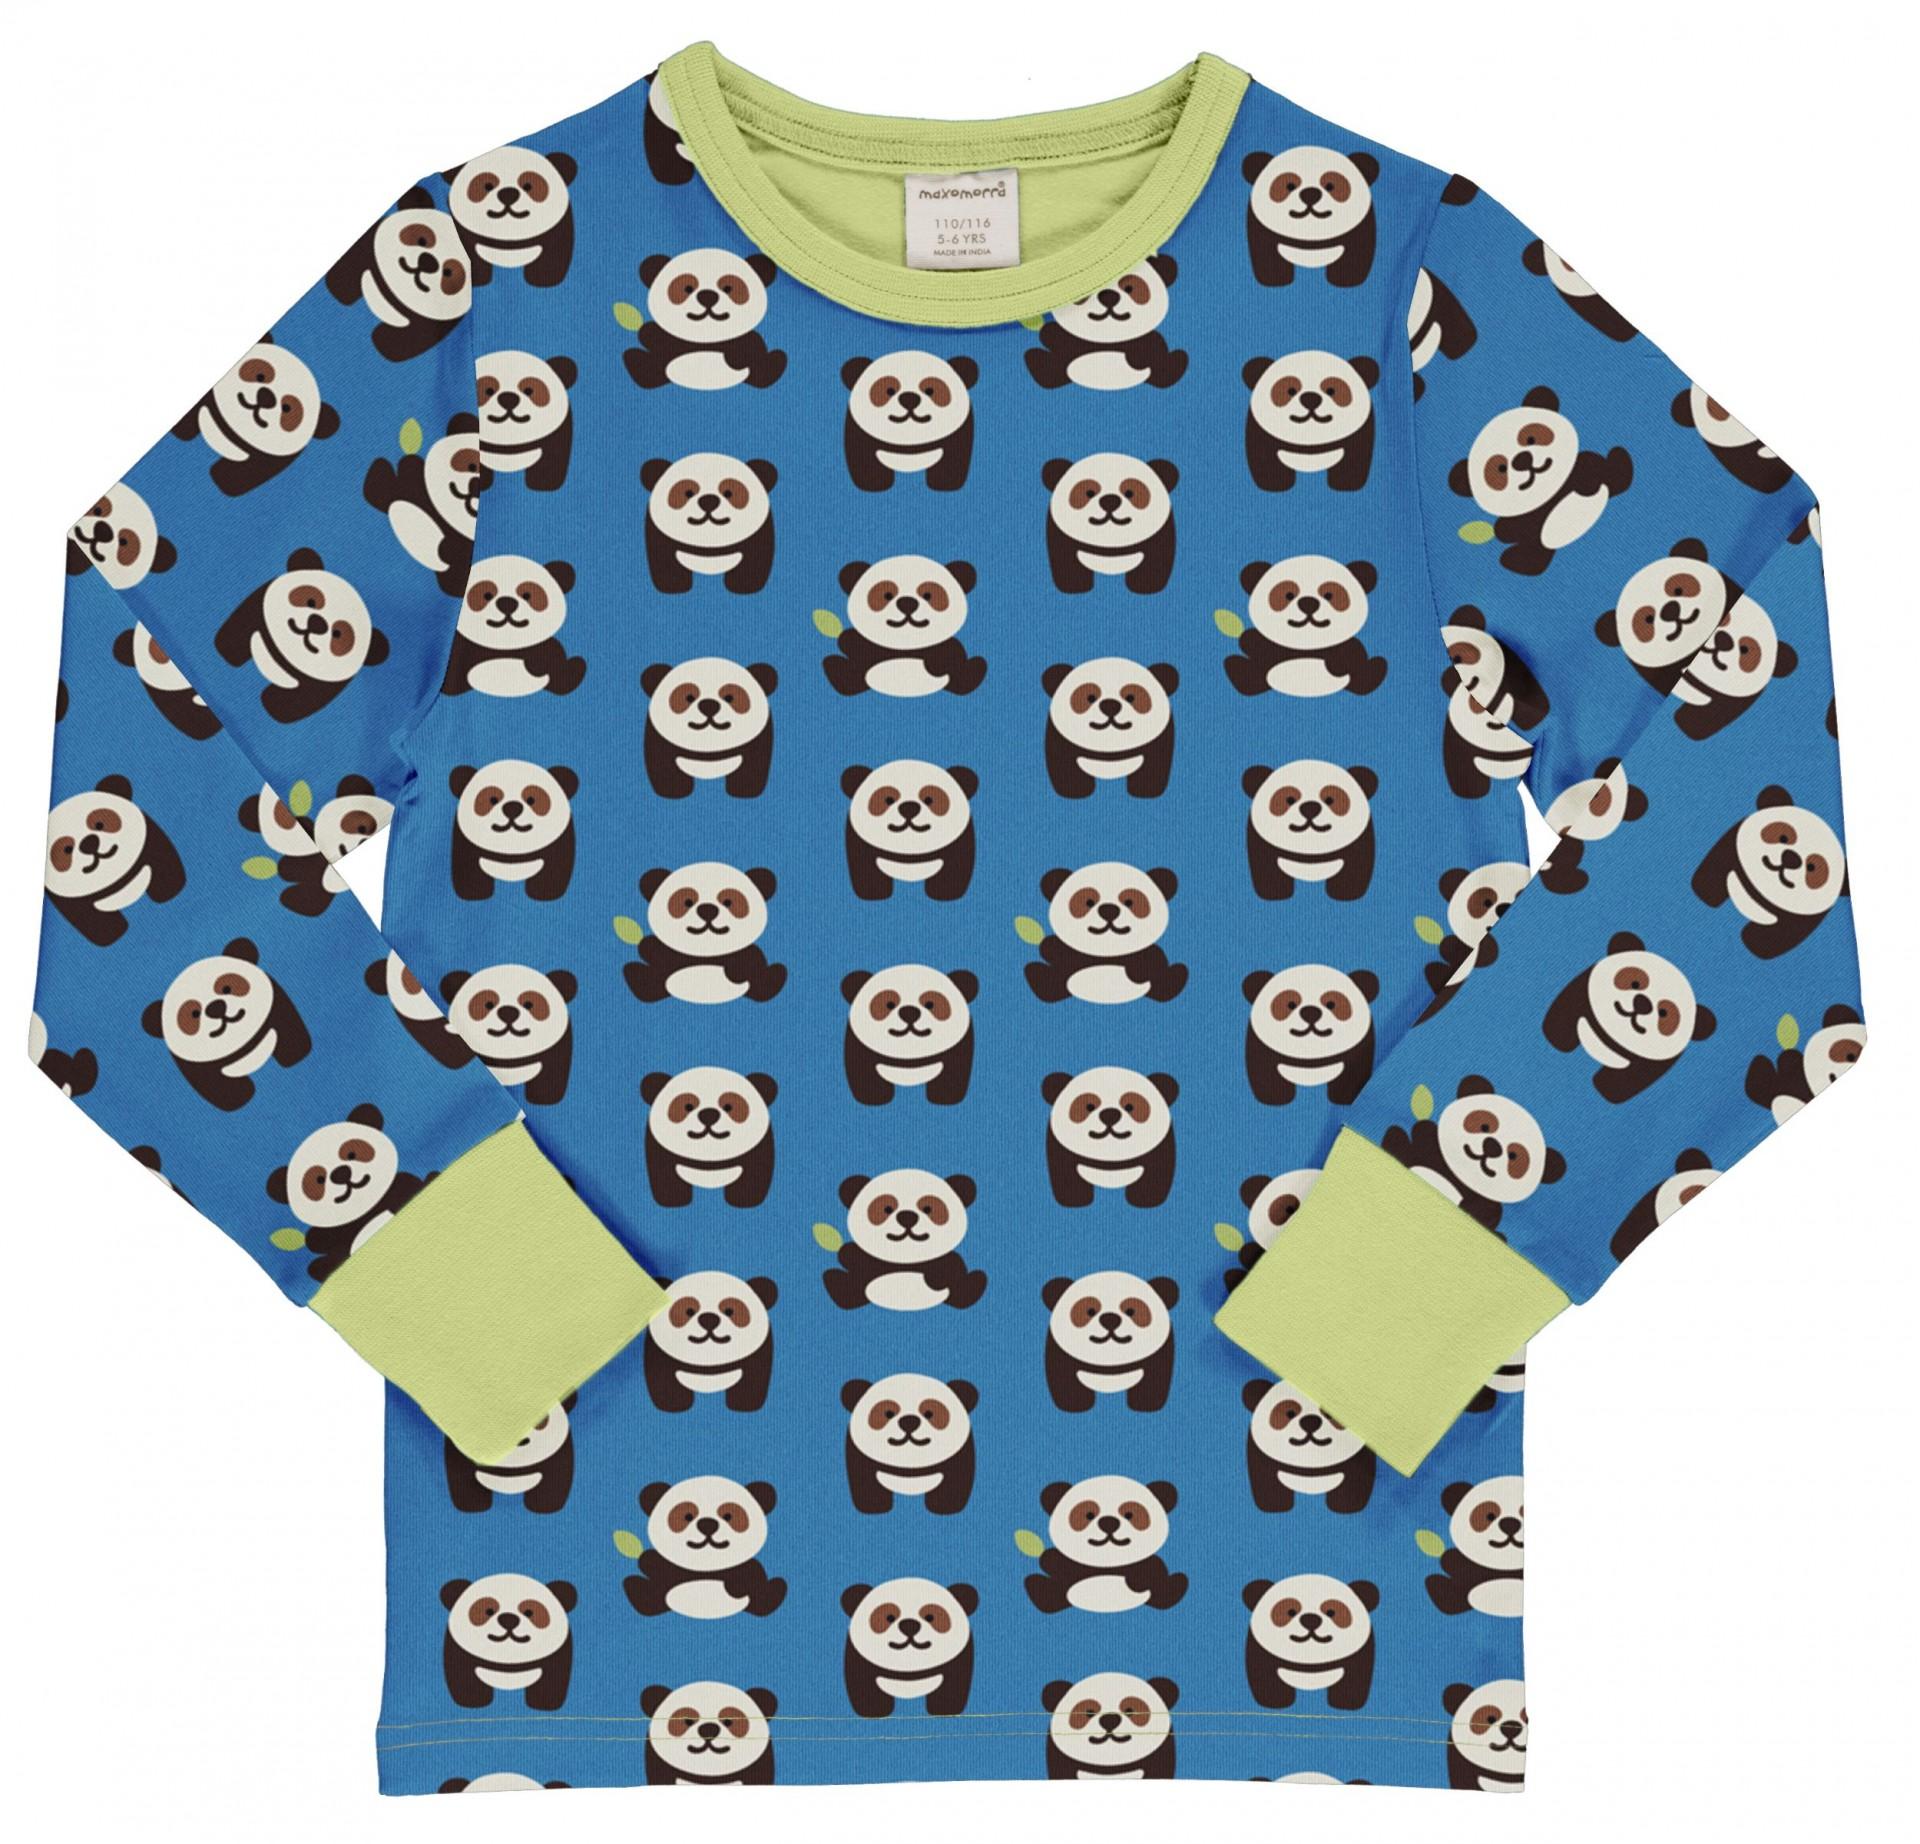 Camisola Playful Panda Maxomorra (Tamanhos disponíveis 9-12)